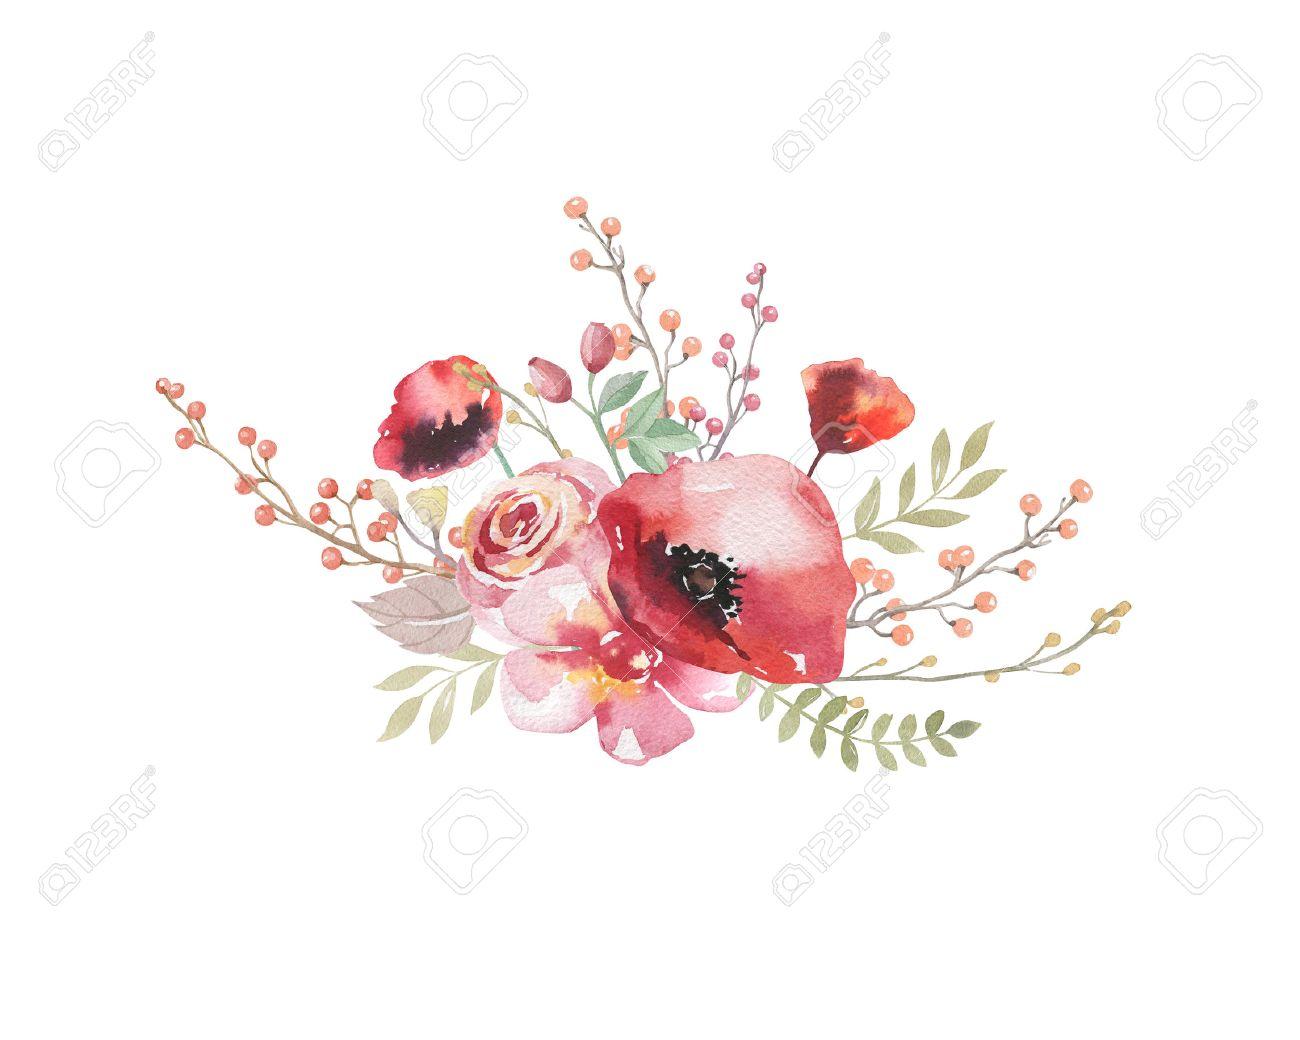 Watercolor Vintage Floral Bouquet Boho Spring Flowers And Leaf